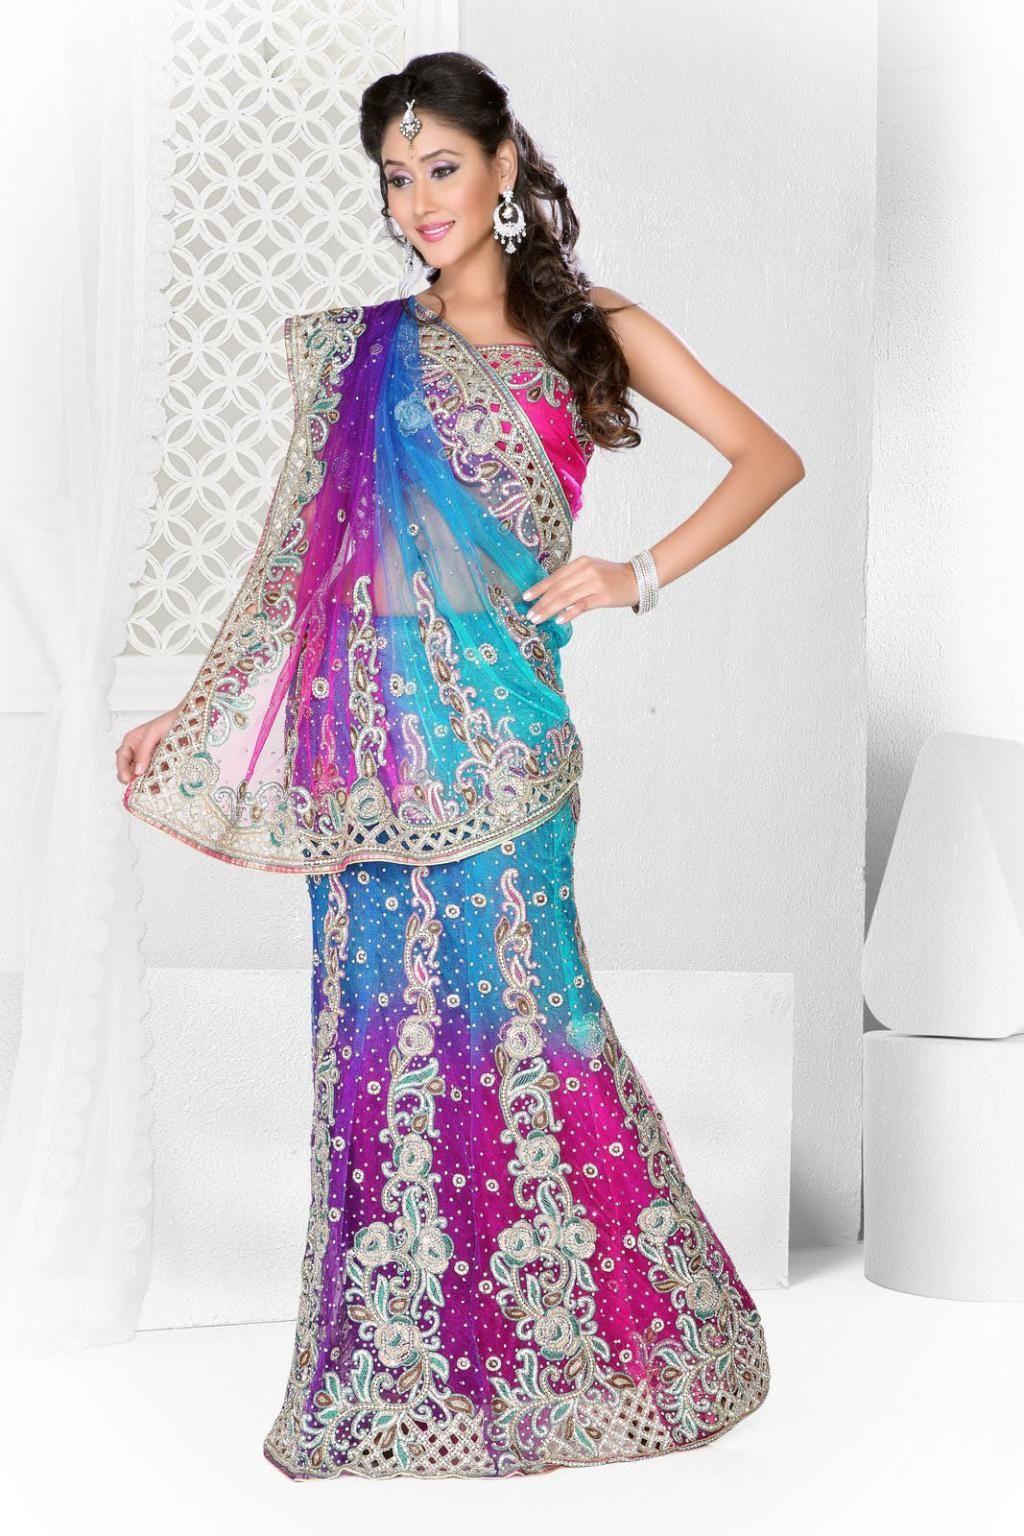 07997b5457 Blue and Pink Stone Work Net A Line Lehenga Saree 22670 | Bridal ...